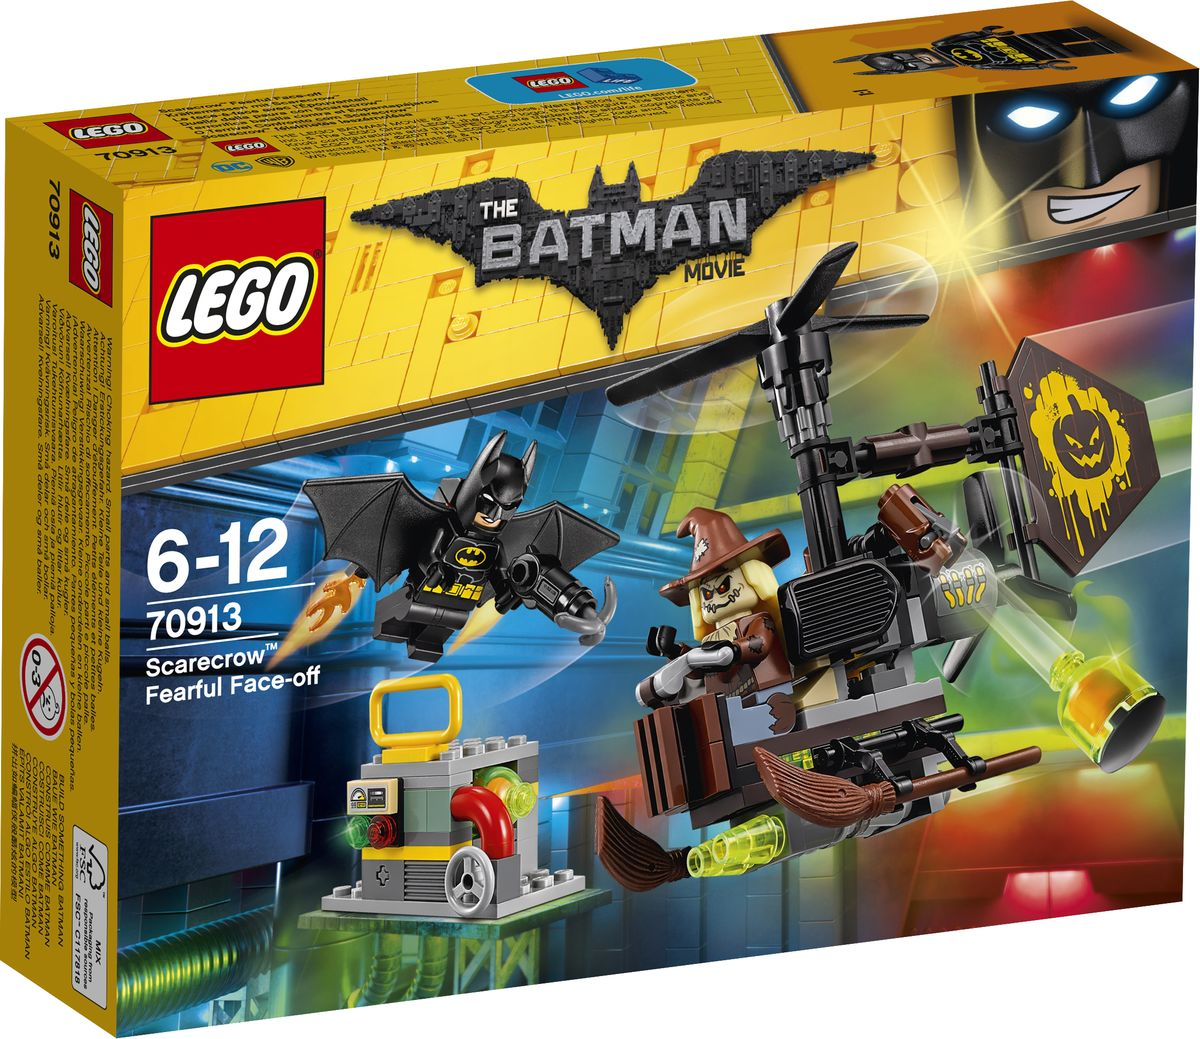 LEGO Batman Movie Конструктор Схватка с Пугалом 70913 lego batman movie 70913 лего фильм бэтмен схватка с пугалом